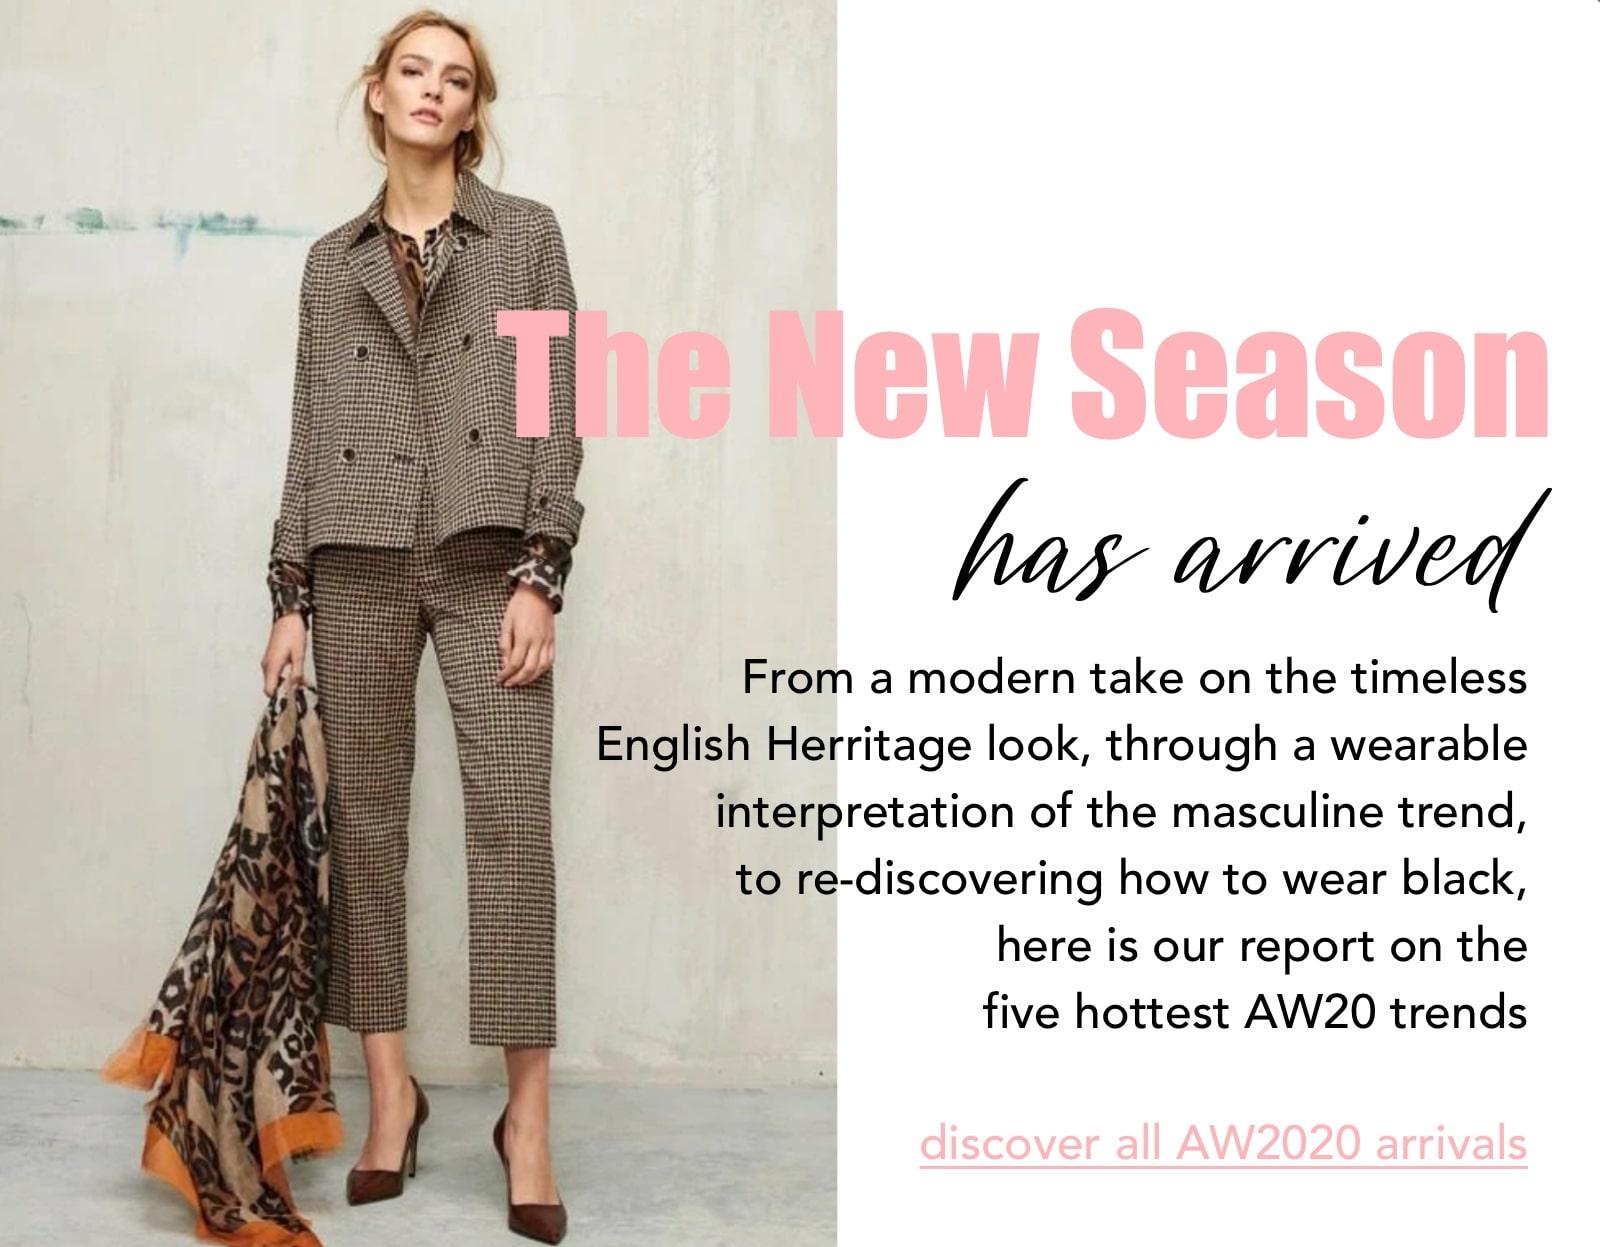 Clothing - Hello Autumn Winter 2020